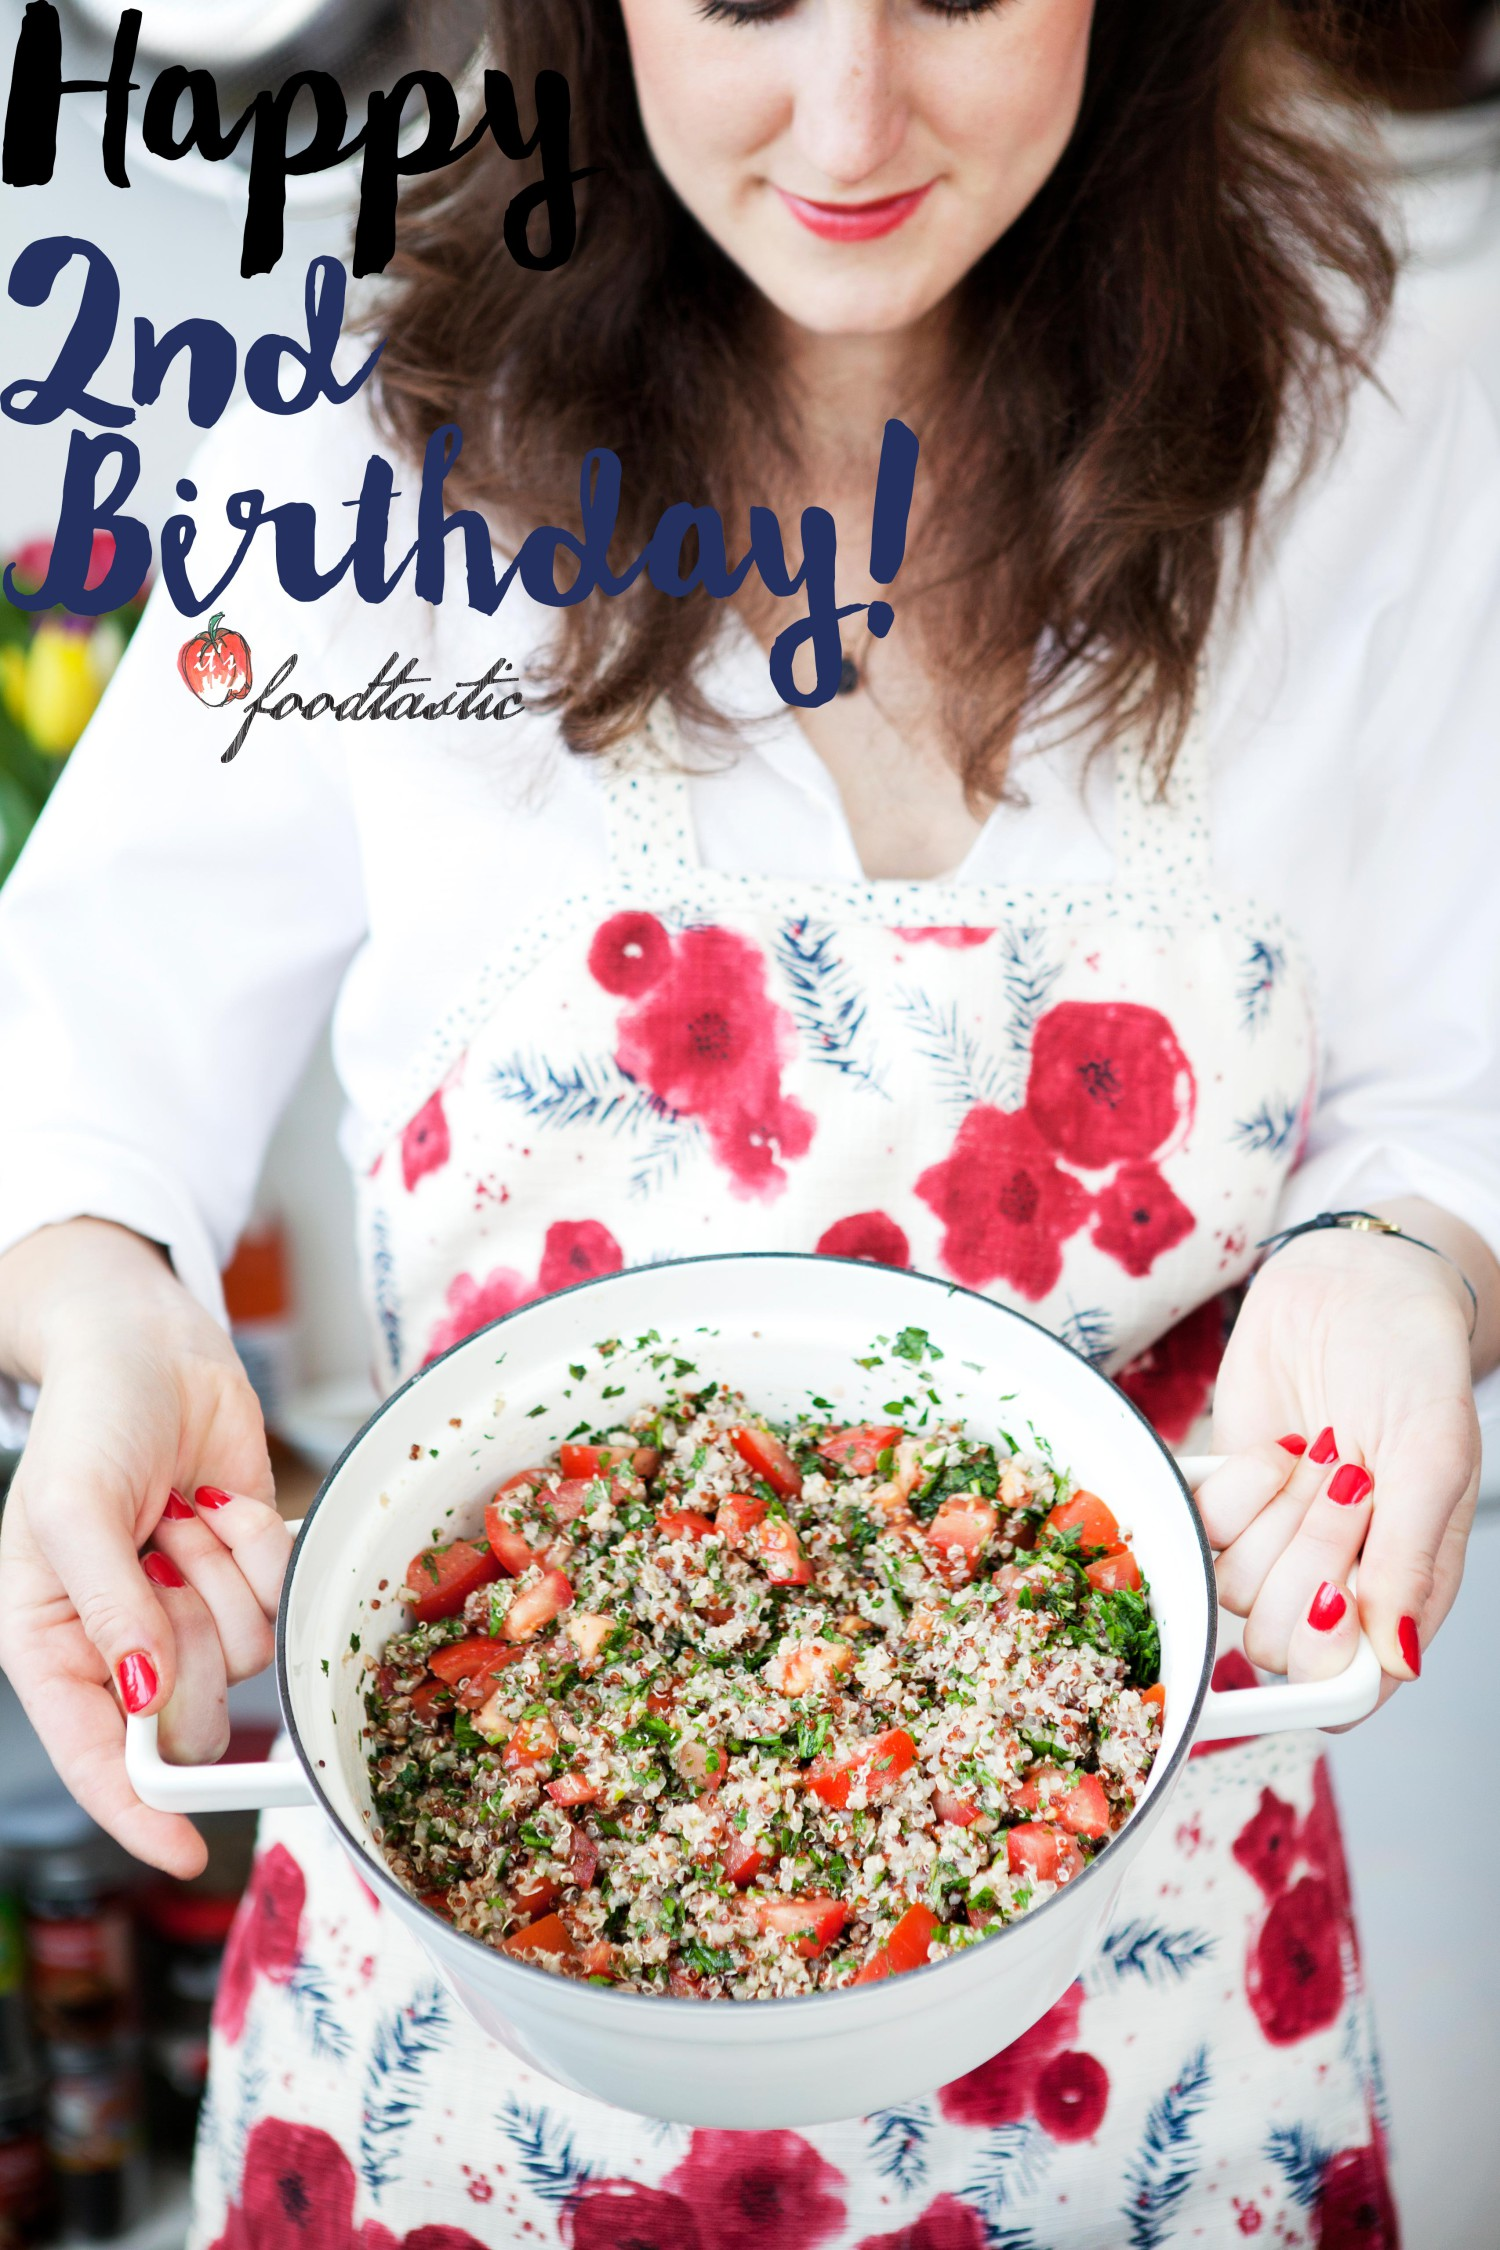 Happy 2nd Birthday Foodtastic